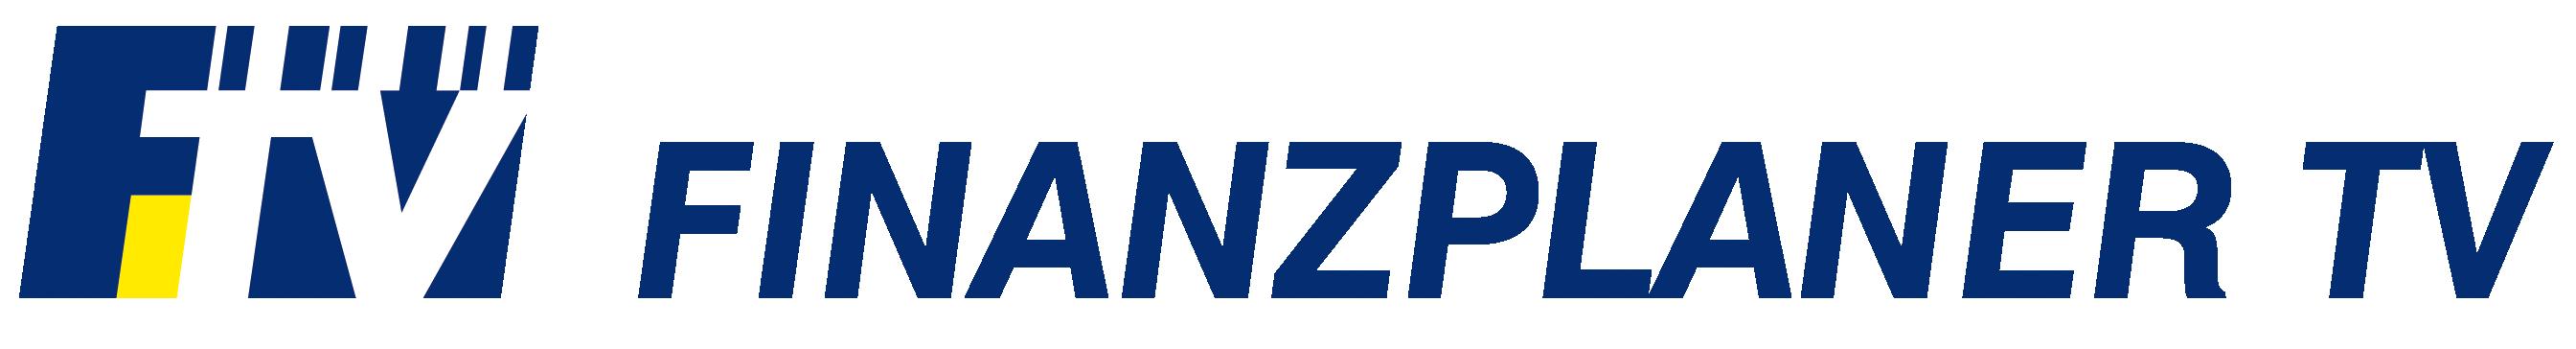 Finanzplaner TV Logo